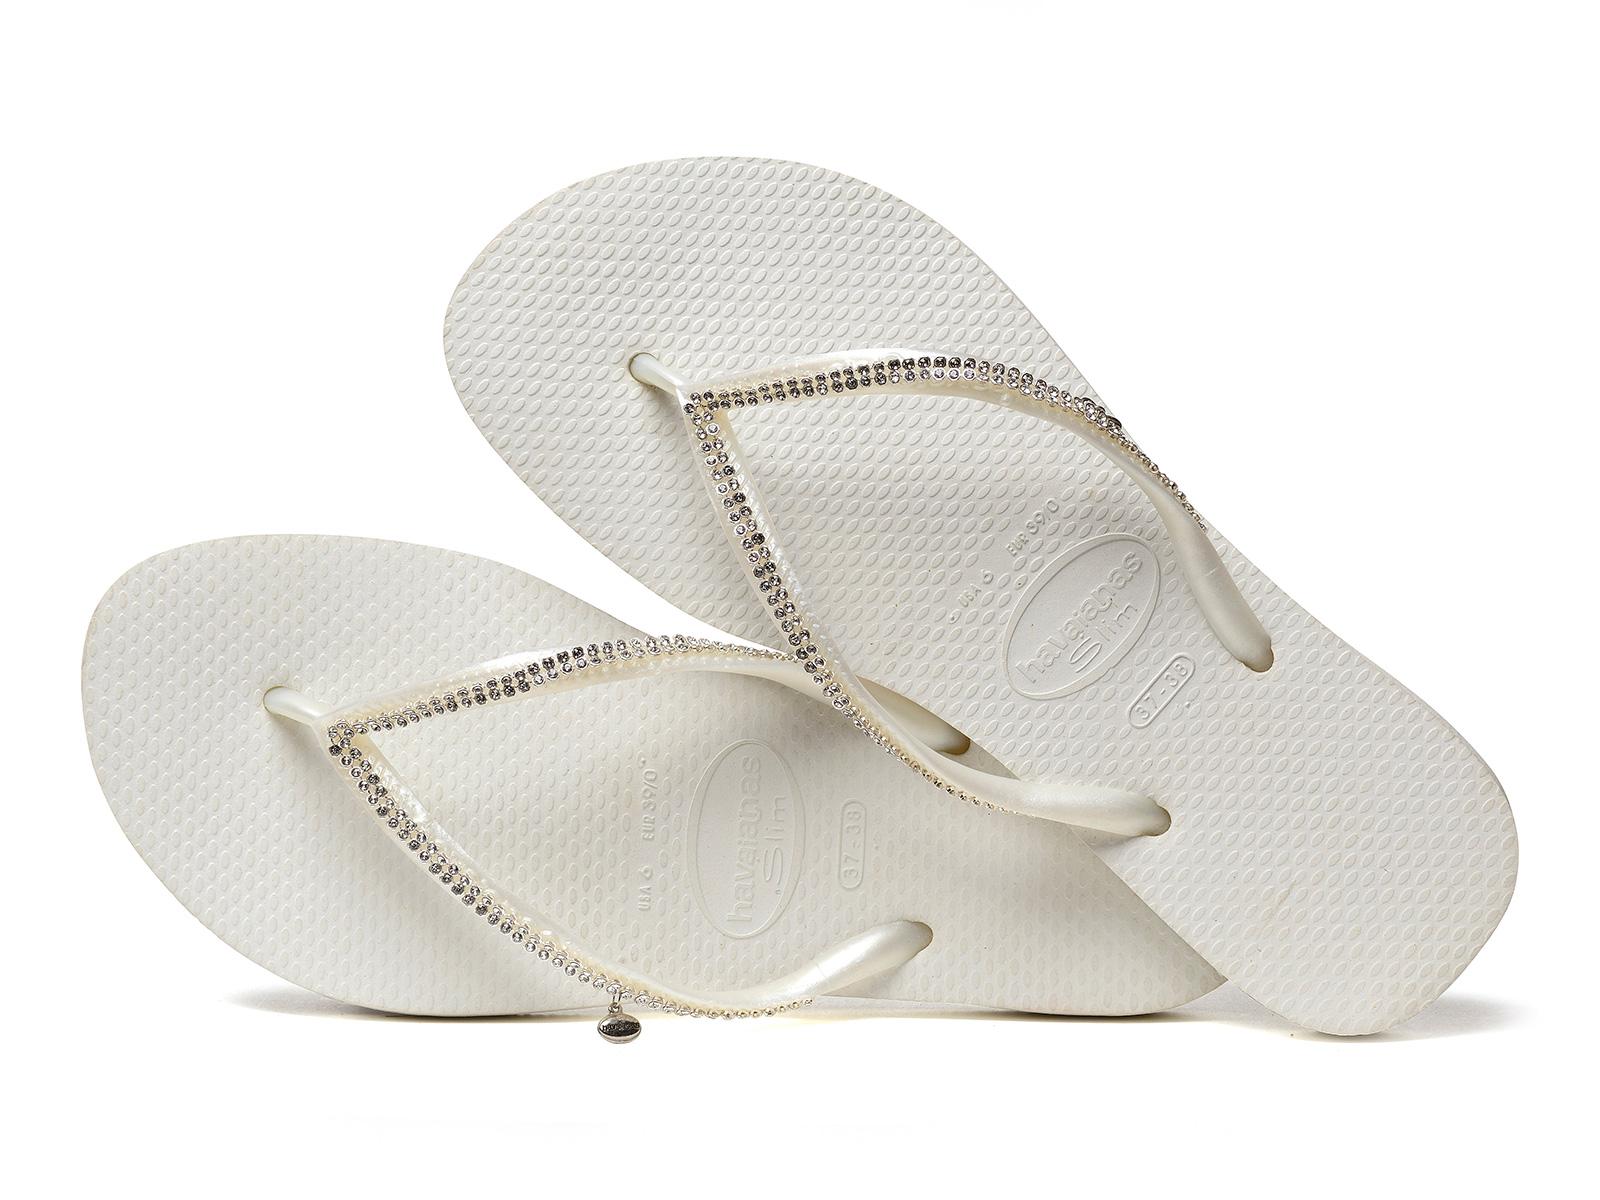 3fa4d9cf9 ... White flip-flops with Swarovski crystals - Slim Crystal Mesh Sw White  ...